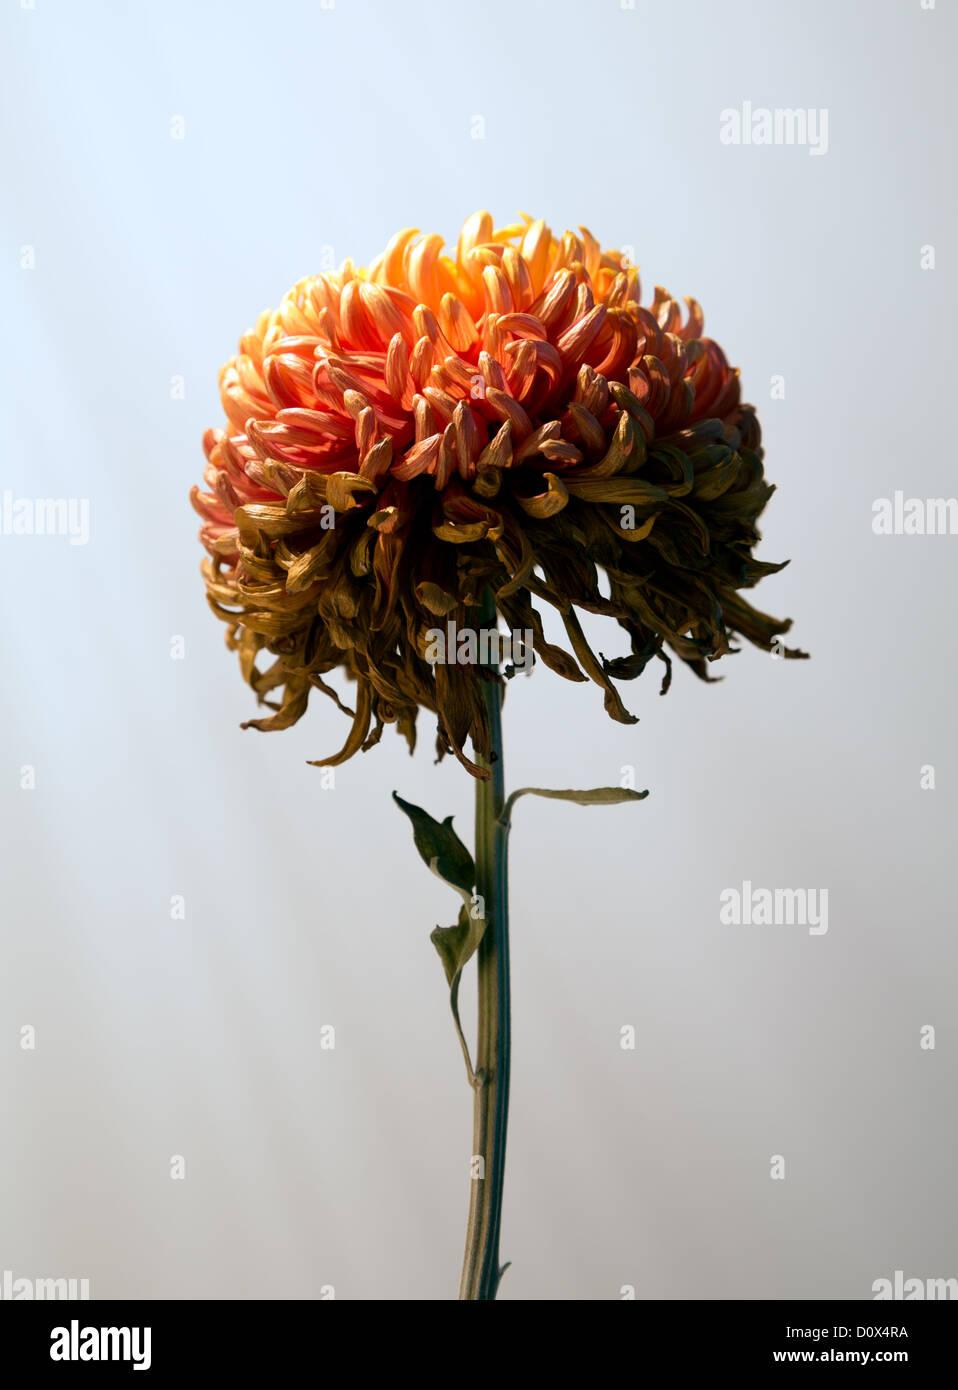 Chrysanthemum immagini chrysanthemum fotos stock alamy - Immagine di terra a colori ...